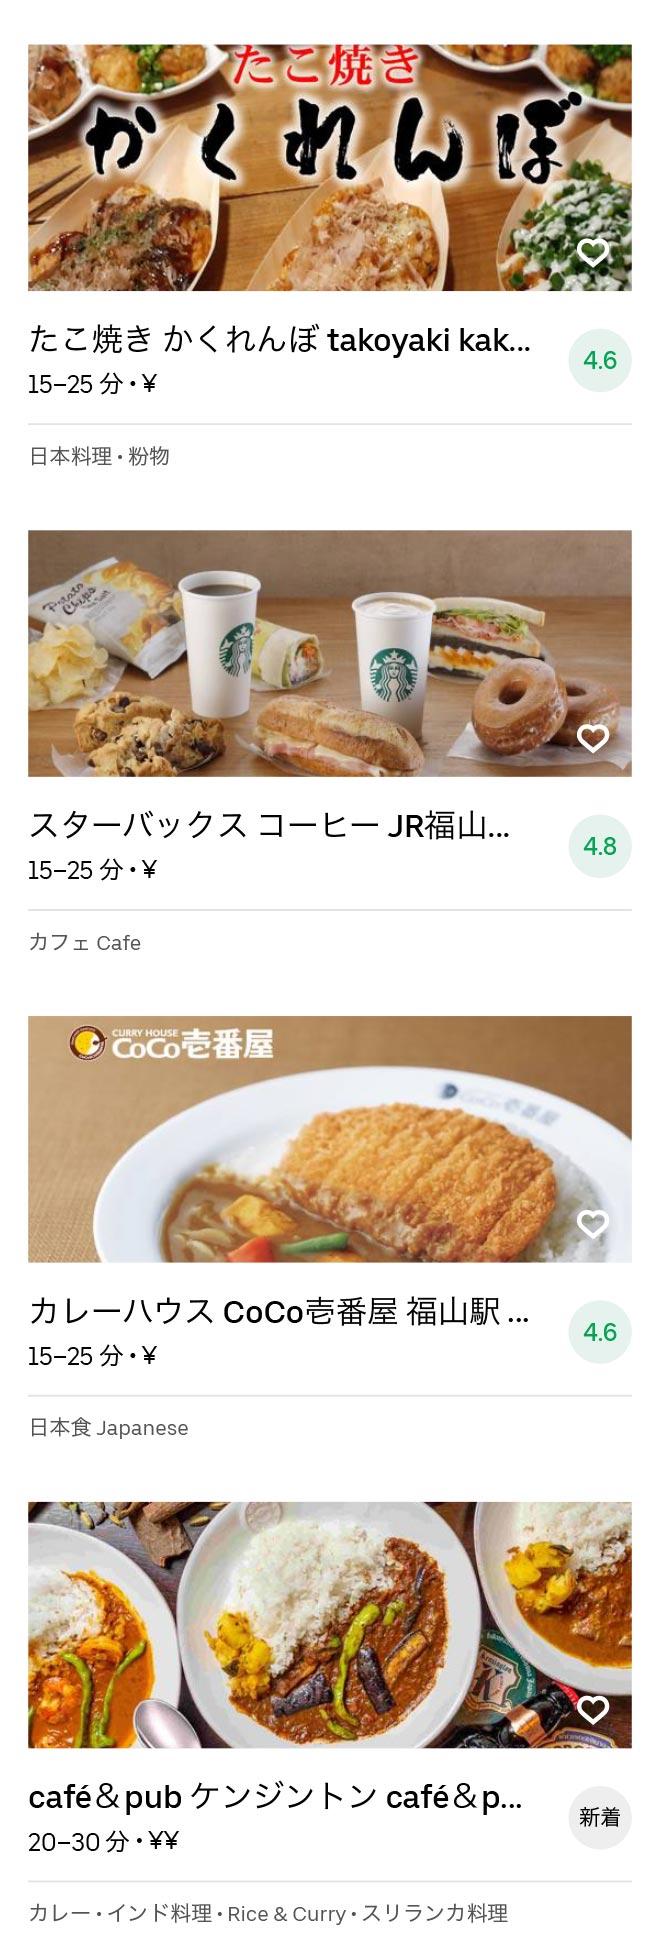 Fukuyama menu 2010 04